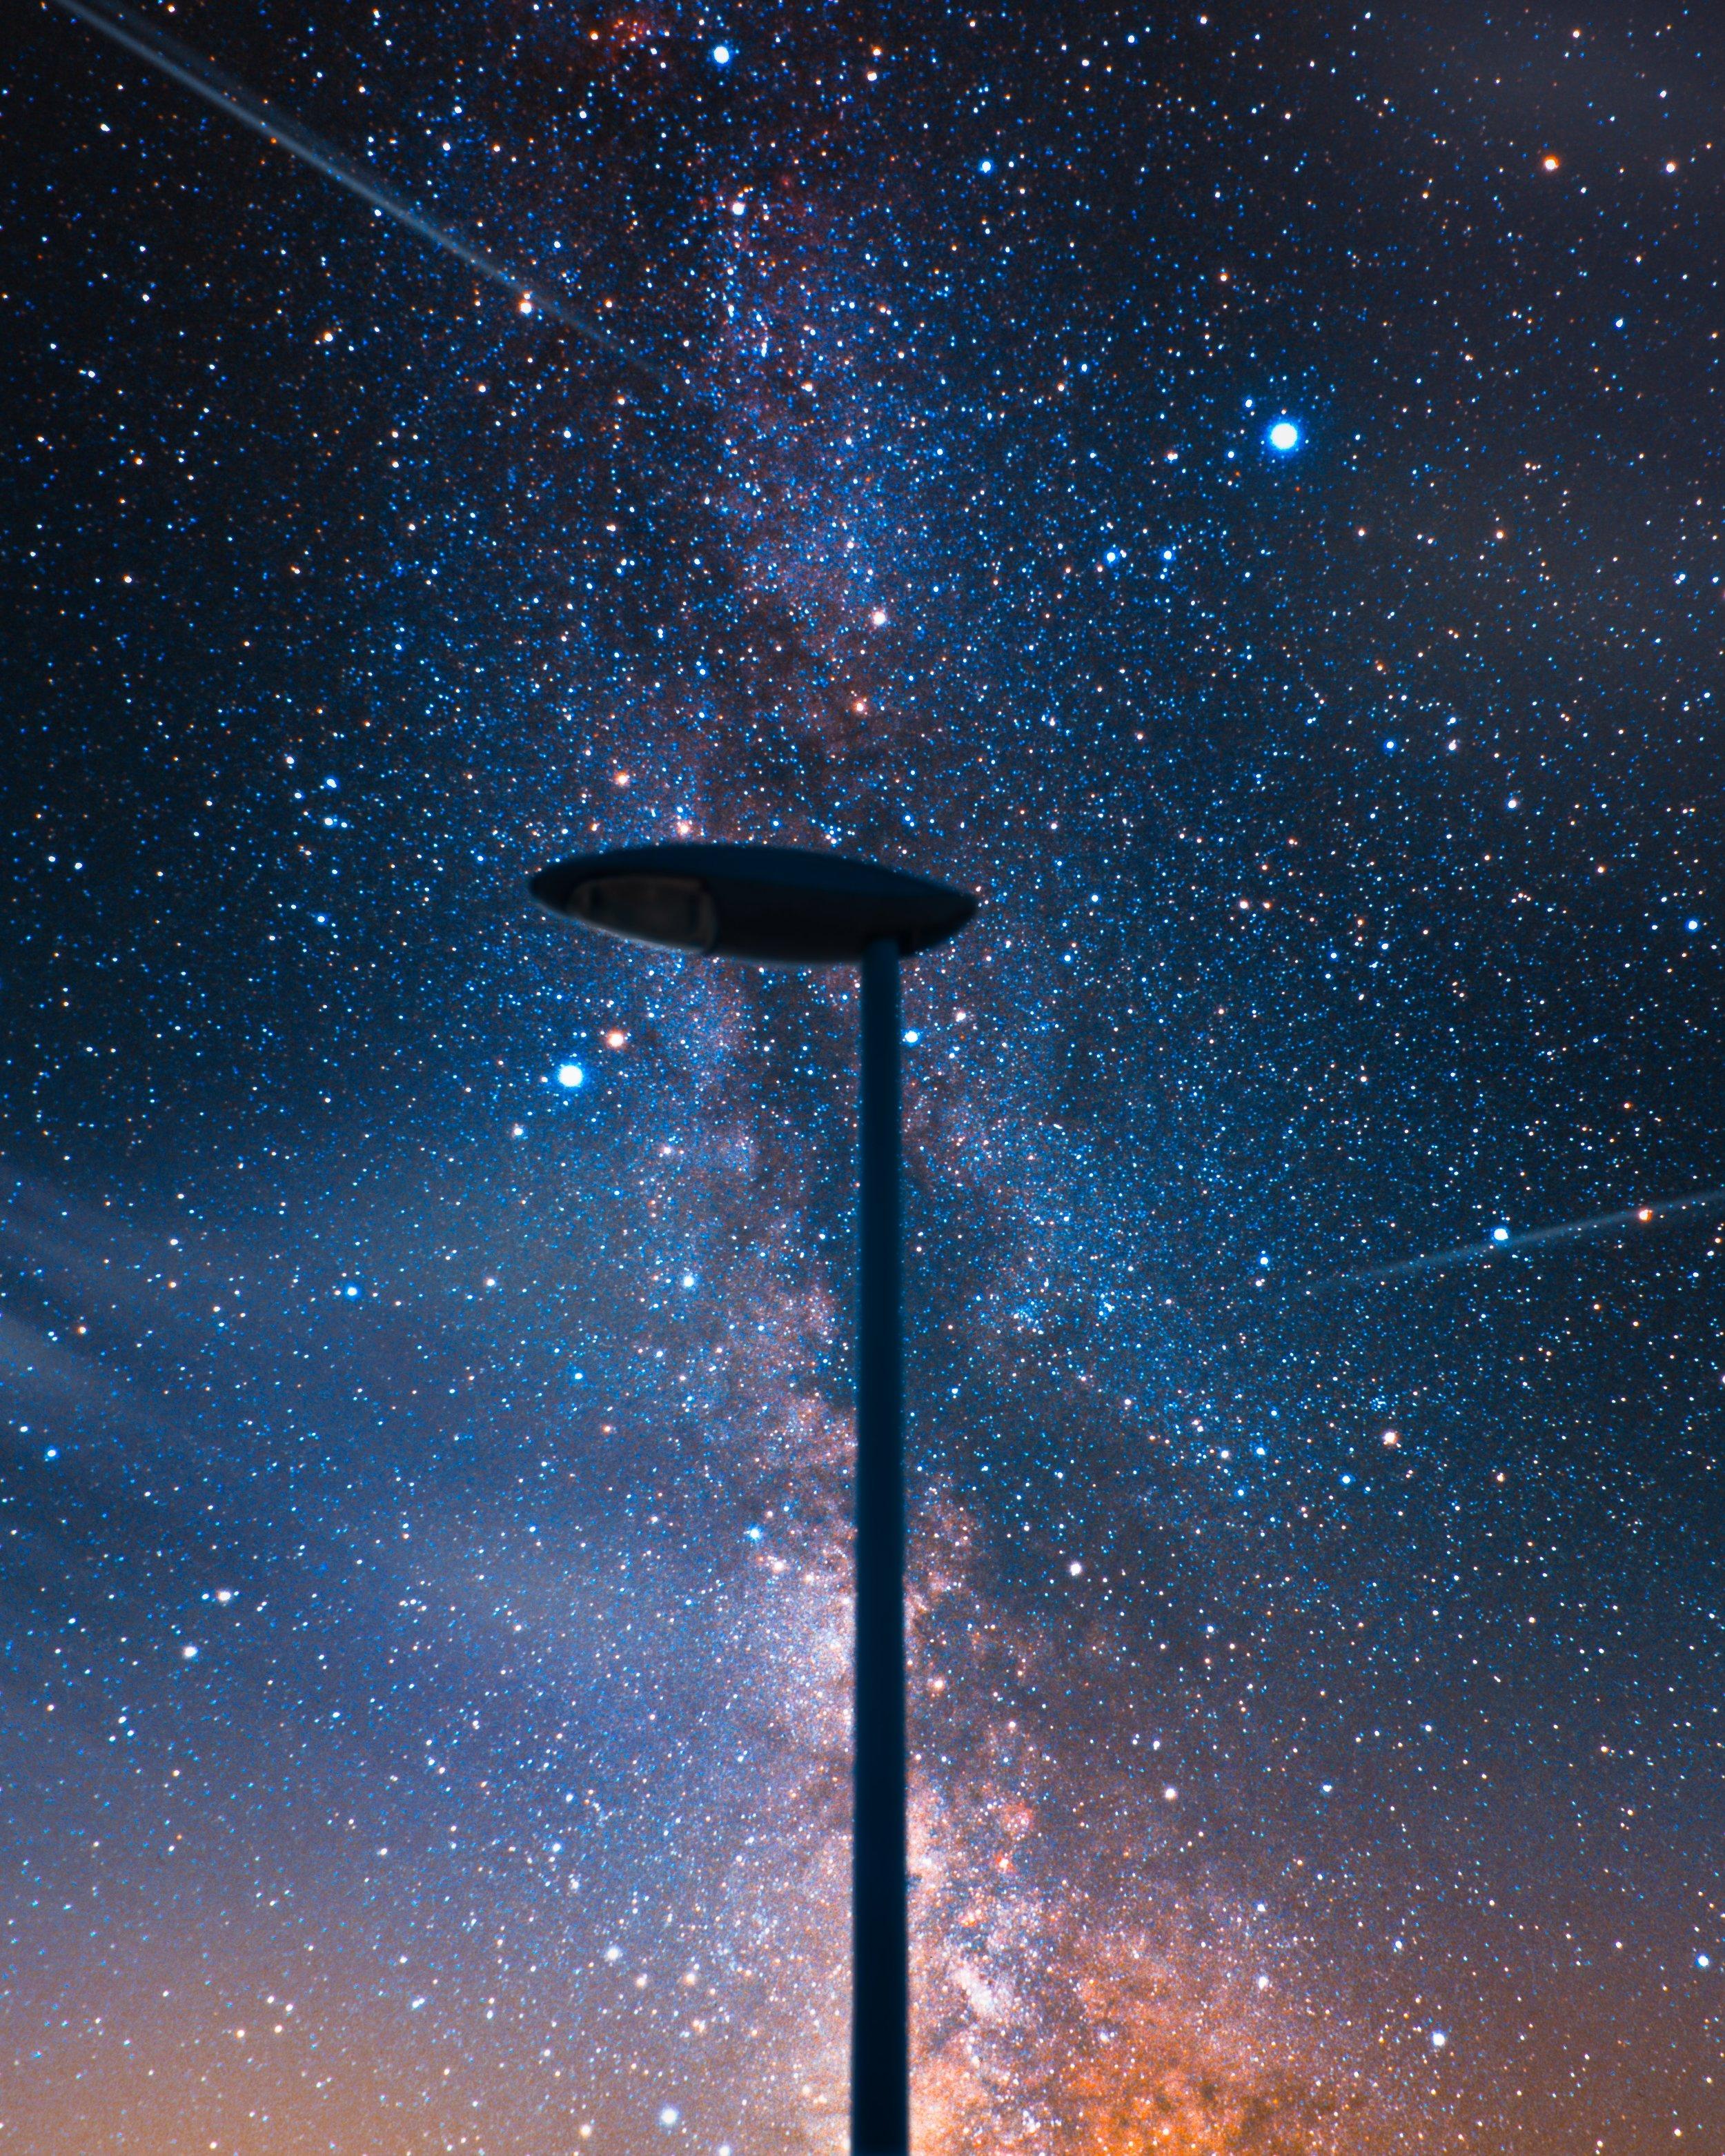 astrology-astronomy-constellation-2498533.jpg